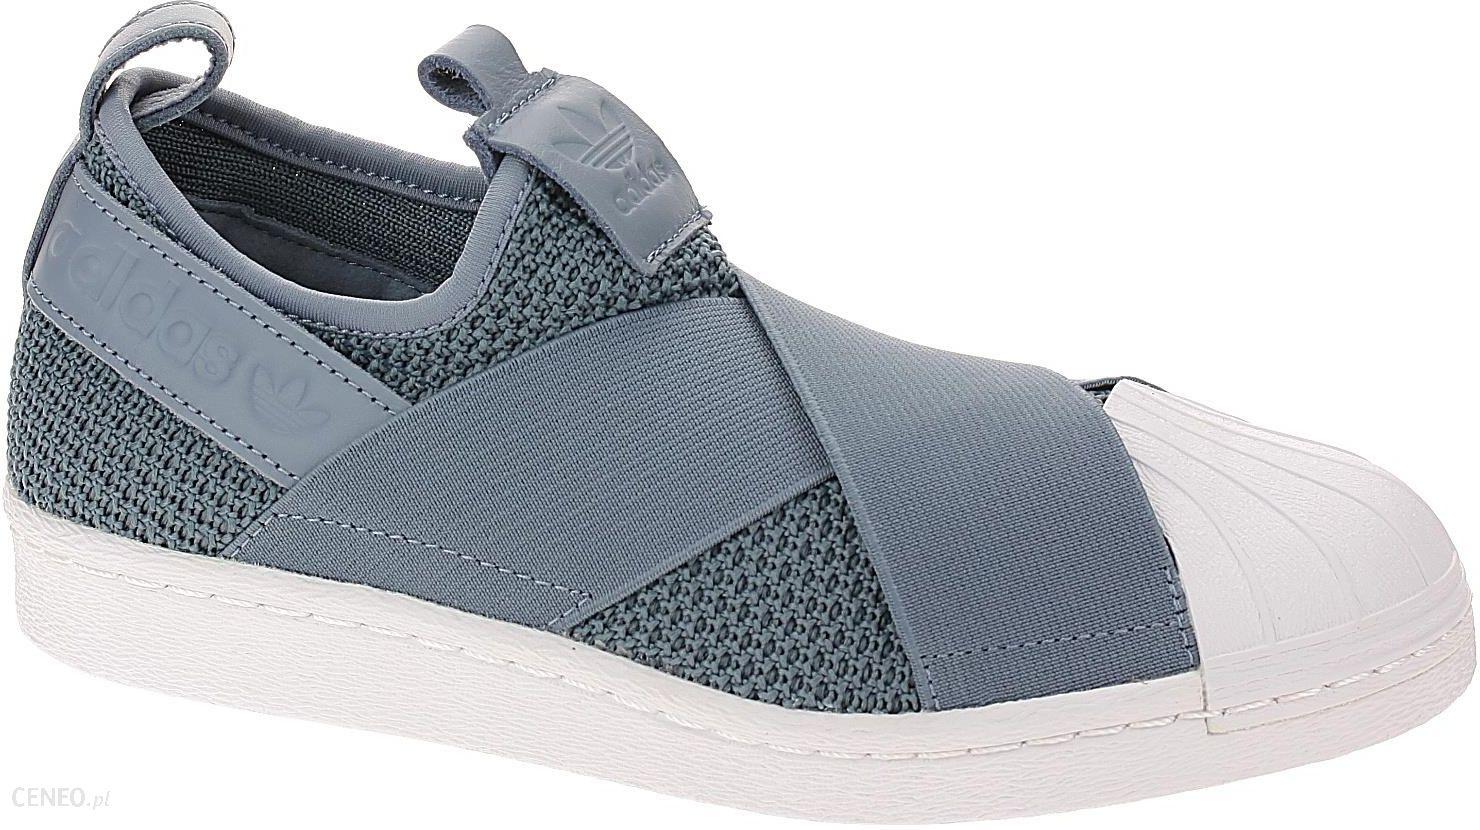 960f85acf1afe3 Buty adidas Originals Superstar Slip-On - Raw Gray/Raw Gray/White 38 ...